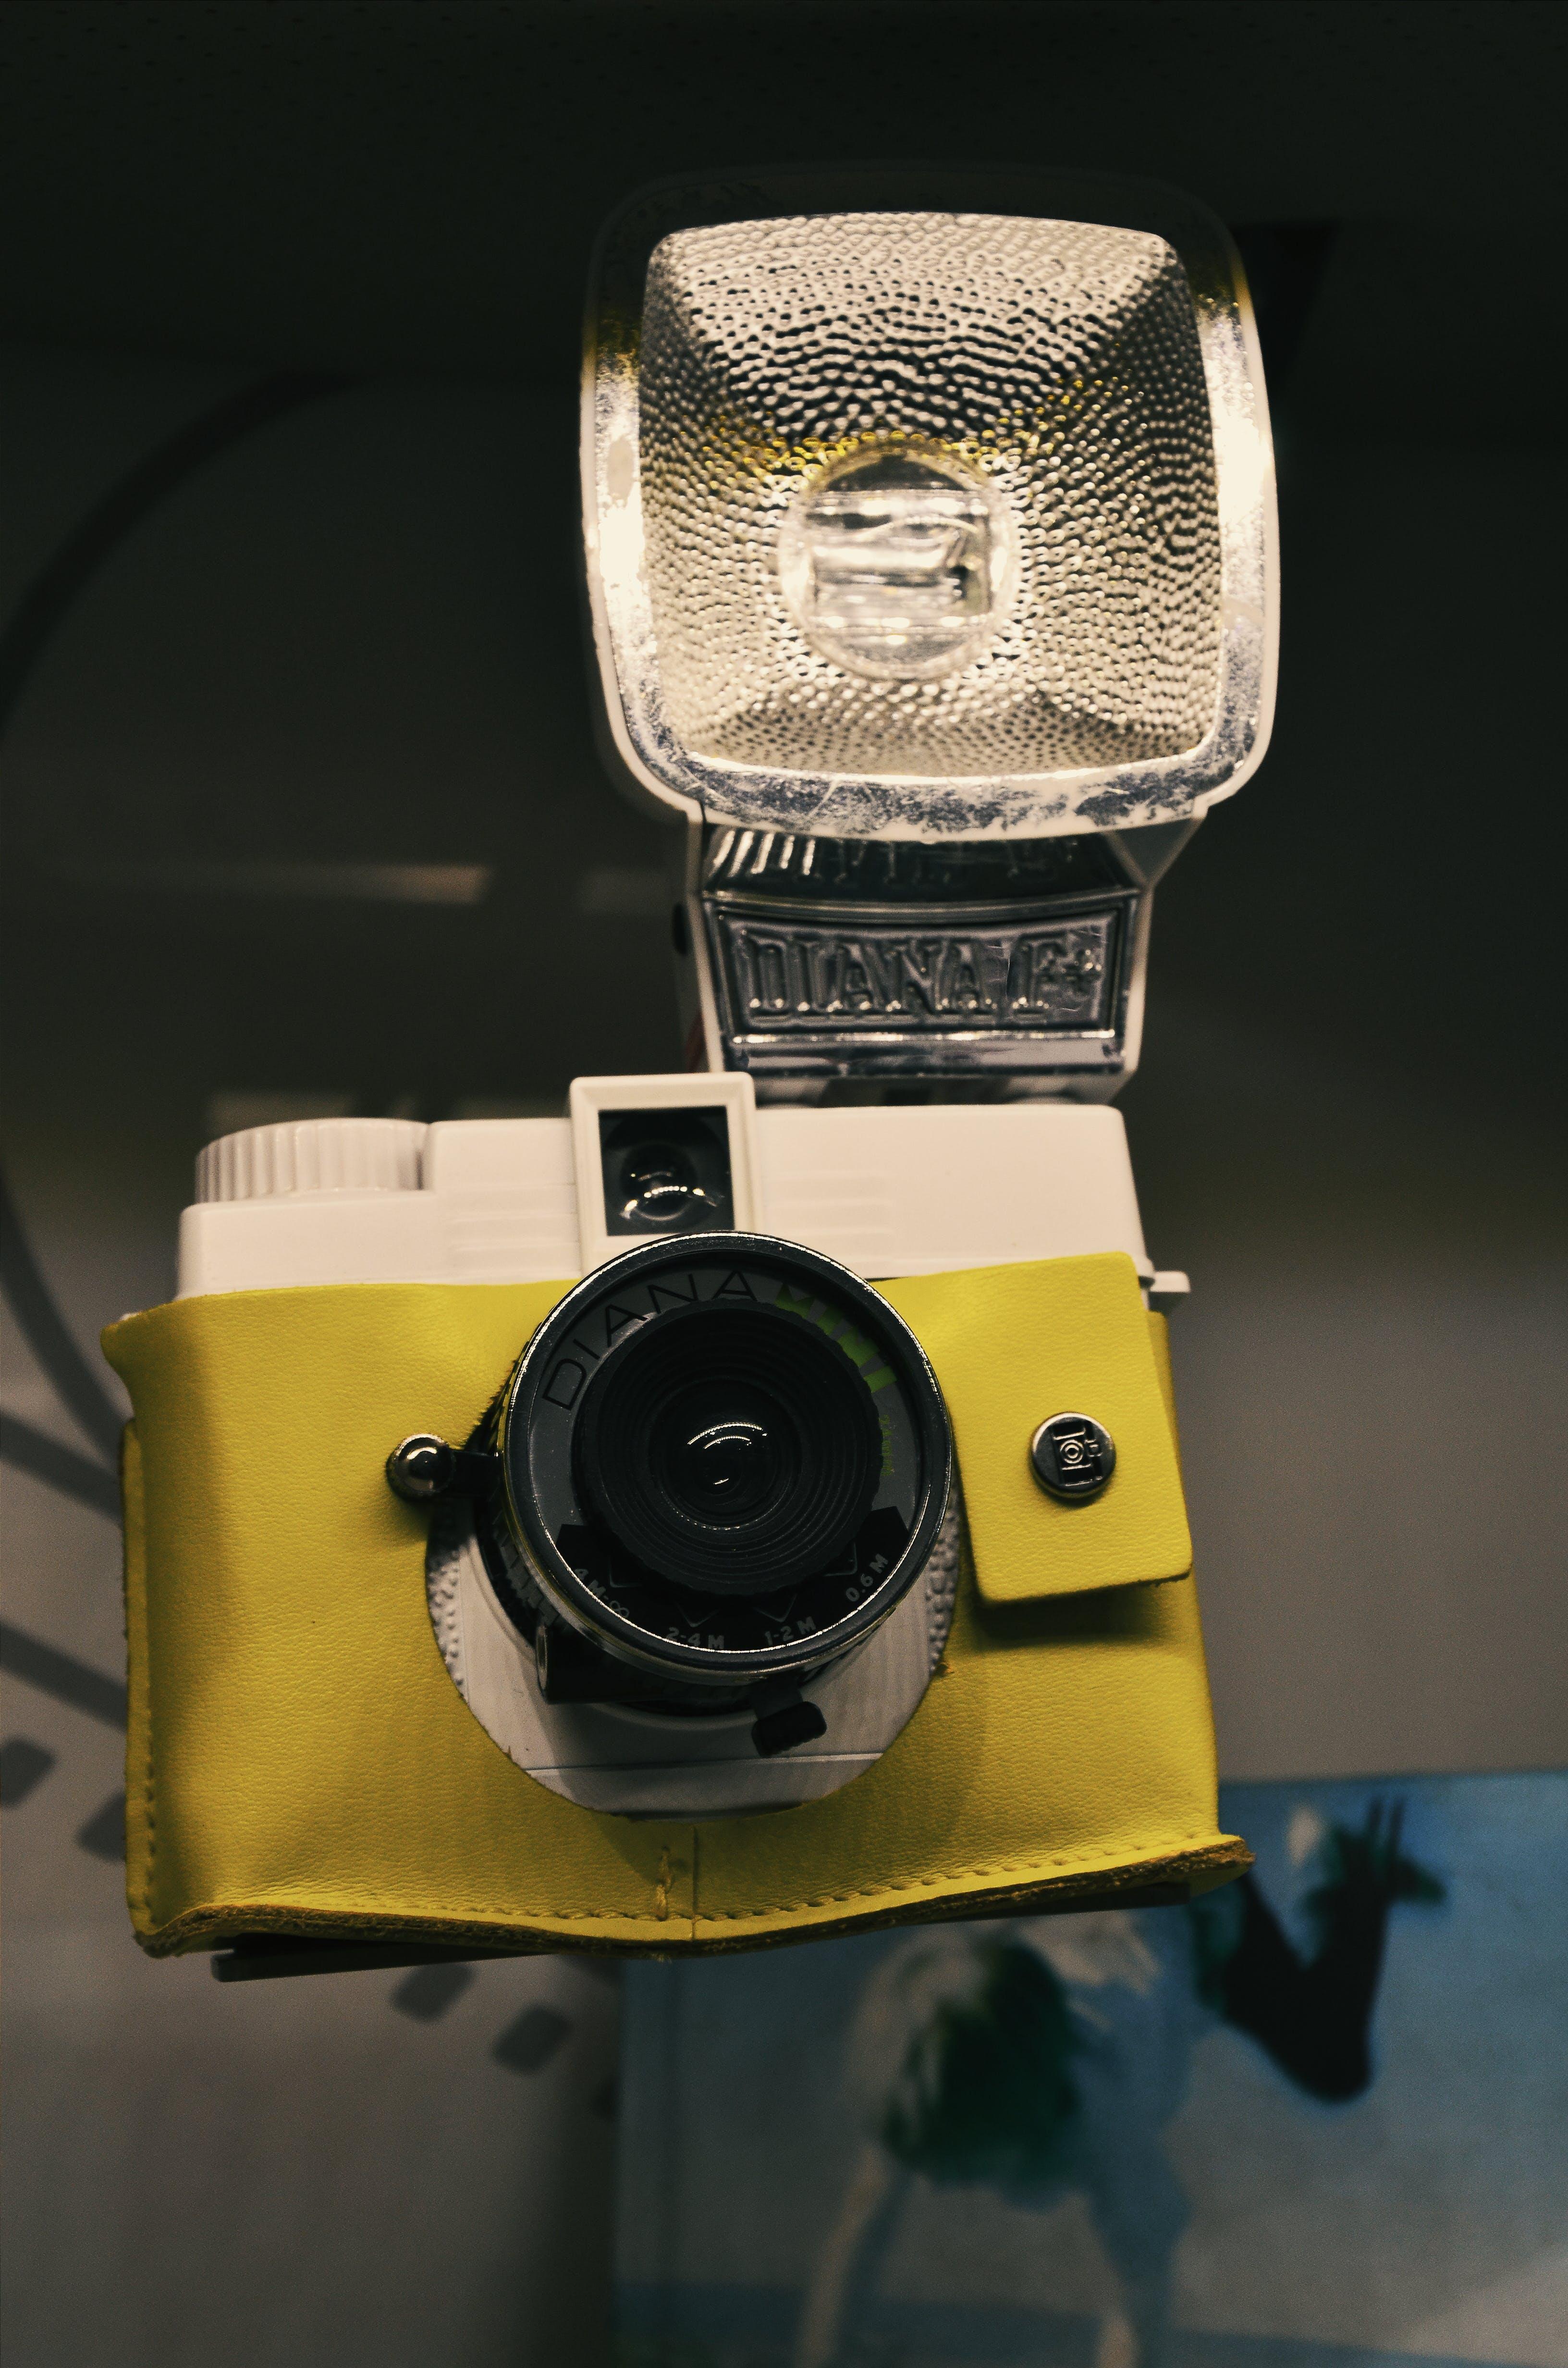 Kostenloses Stock Foto zu blitz, elektrik, kamera, klassisch